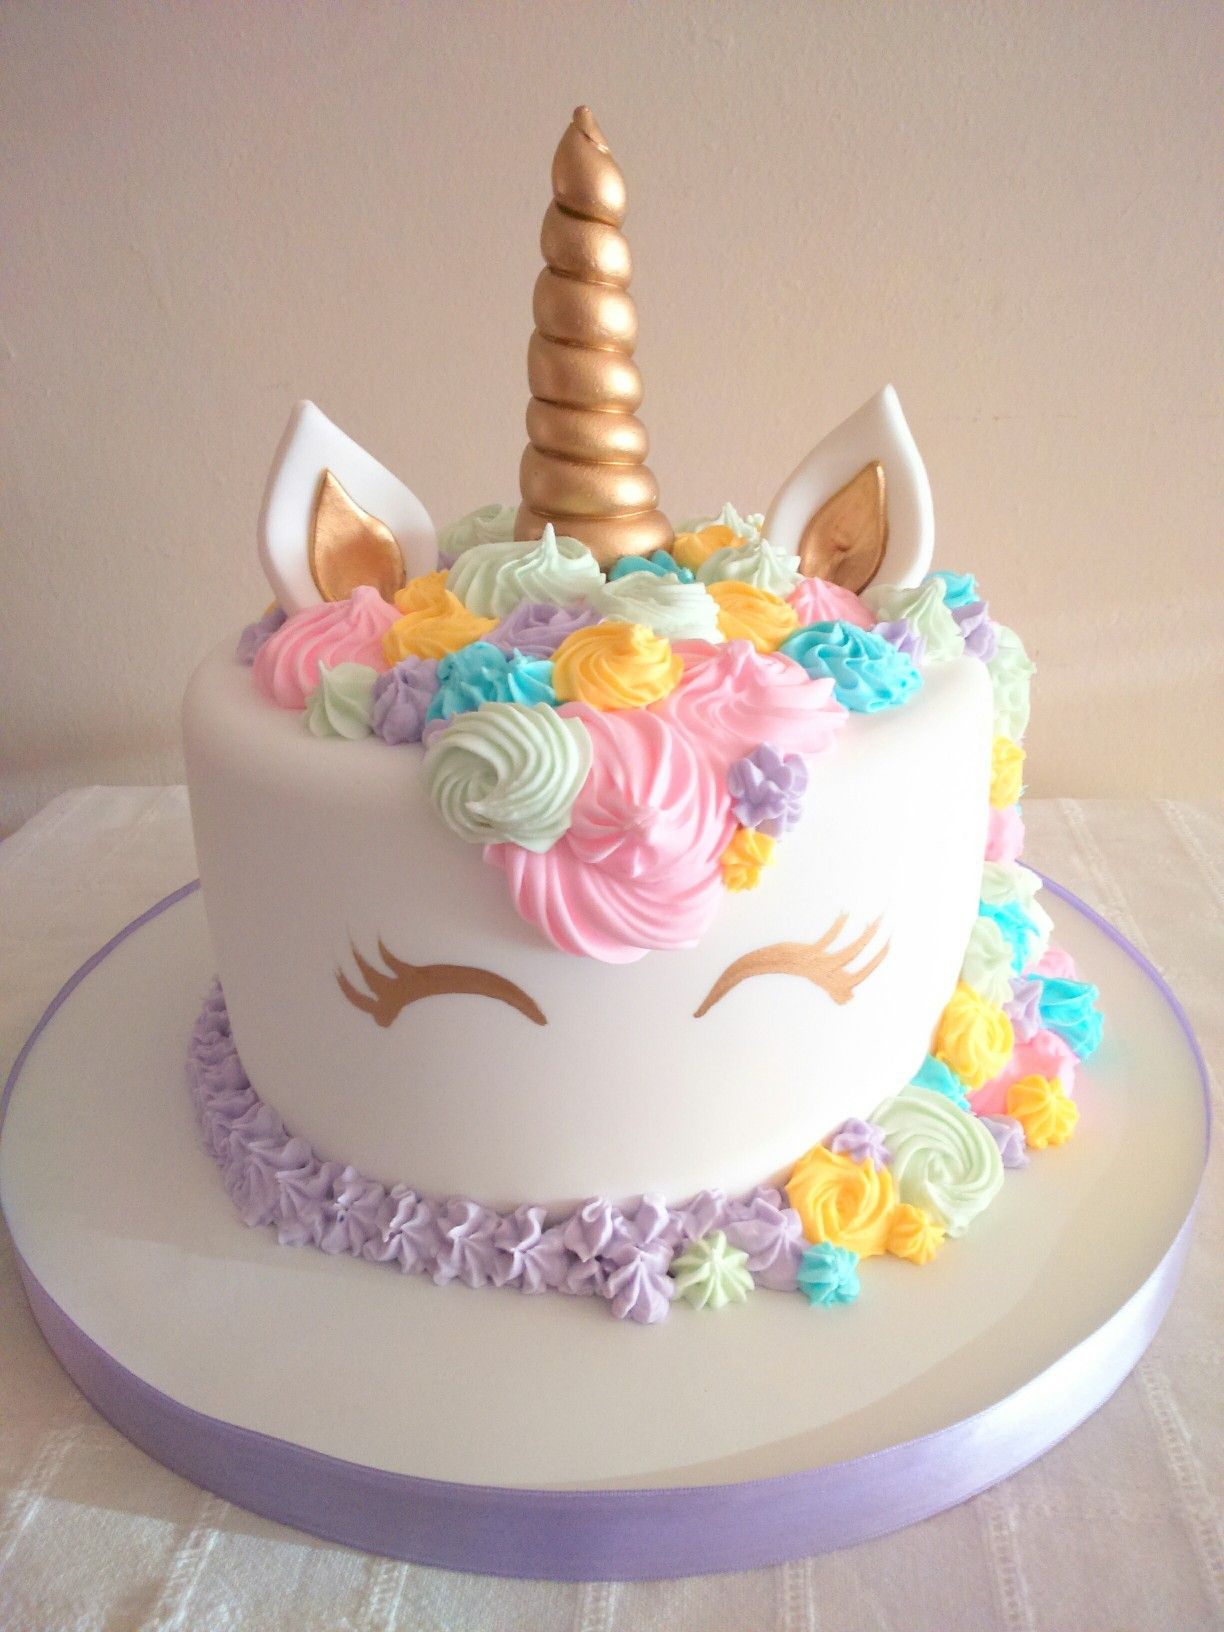 Astonishing Torta Unicornio Unicorn Birthday Cake Unique Birthday Cakes Funny Birthday Cards Online Barepcheapnameinfo